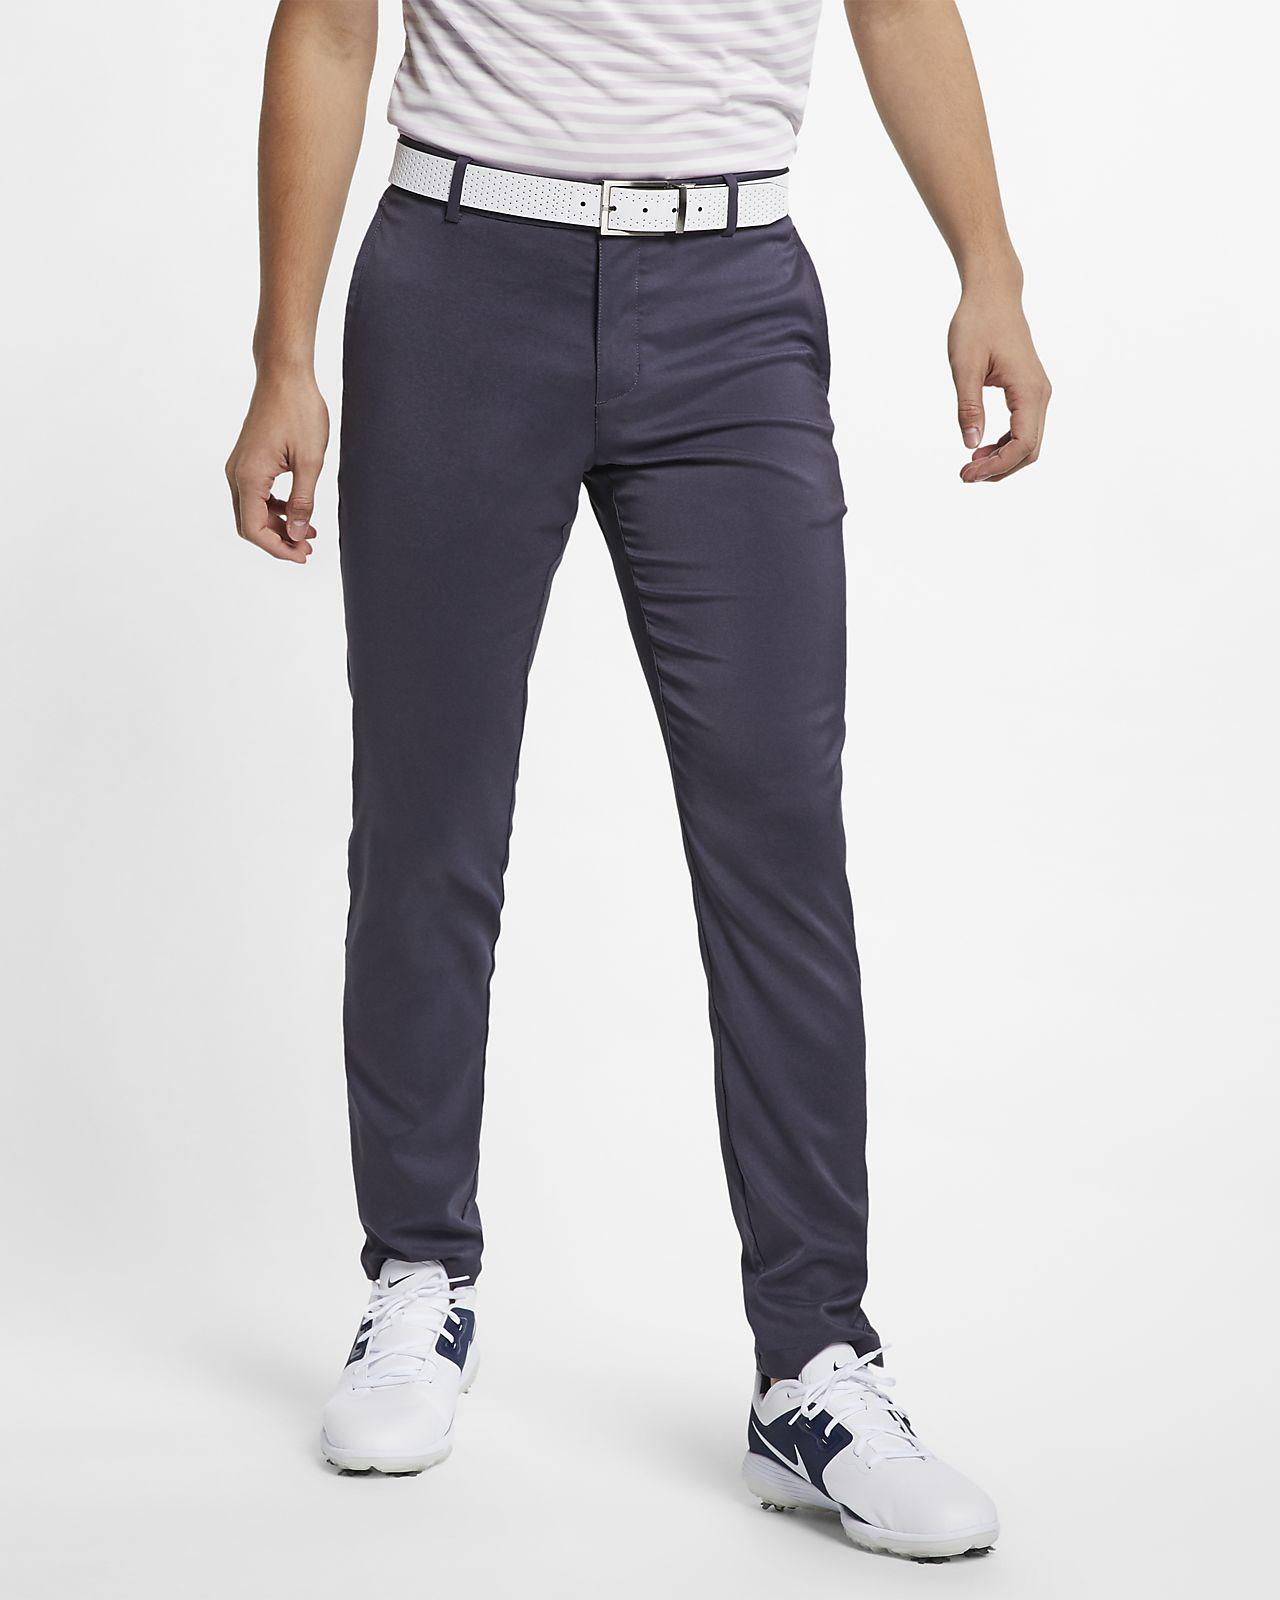 Nike Flex Men's Slim Fit Golf Trousers